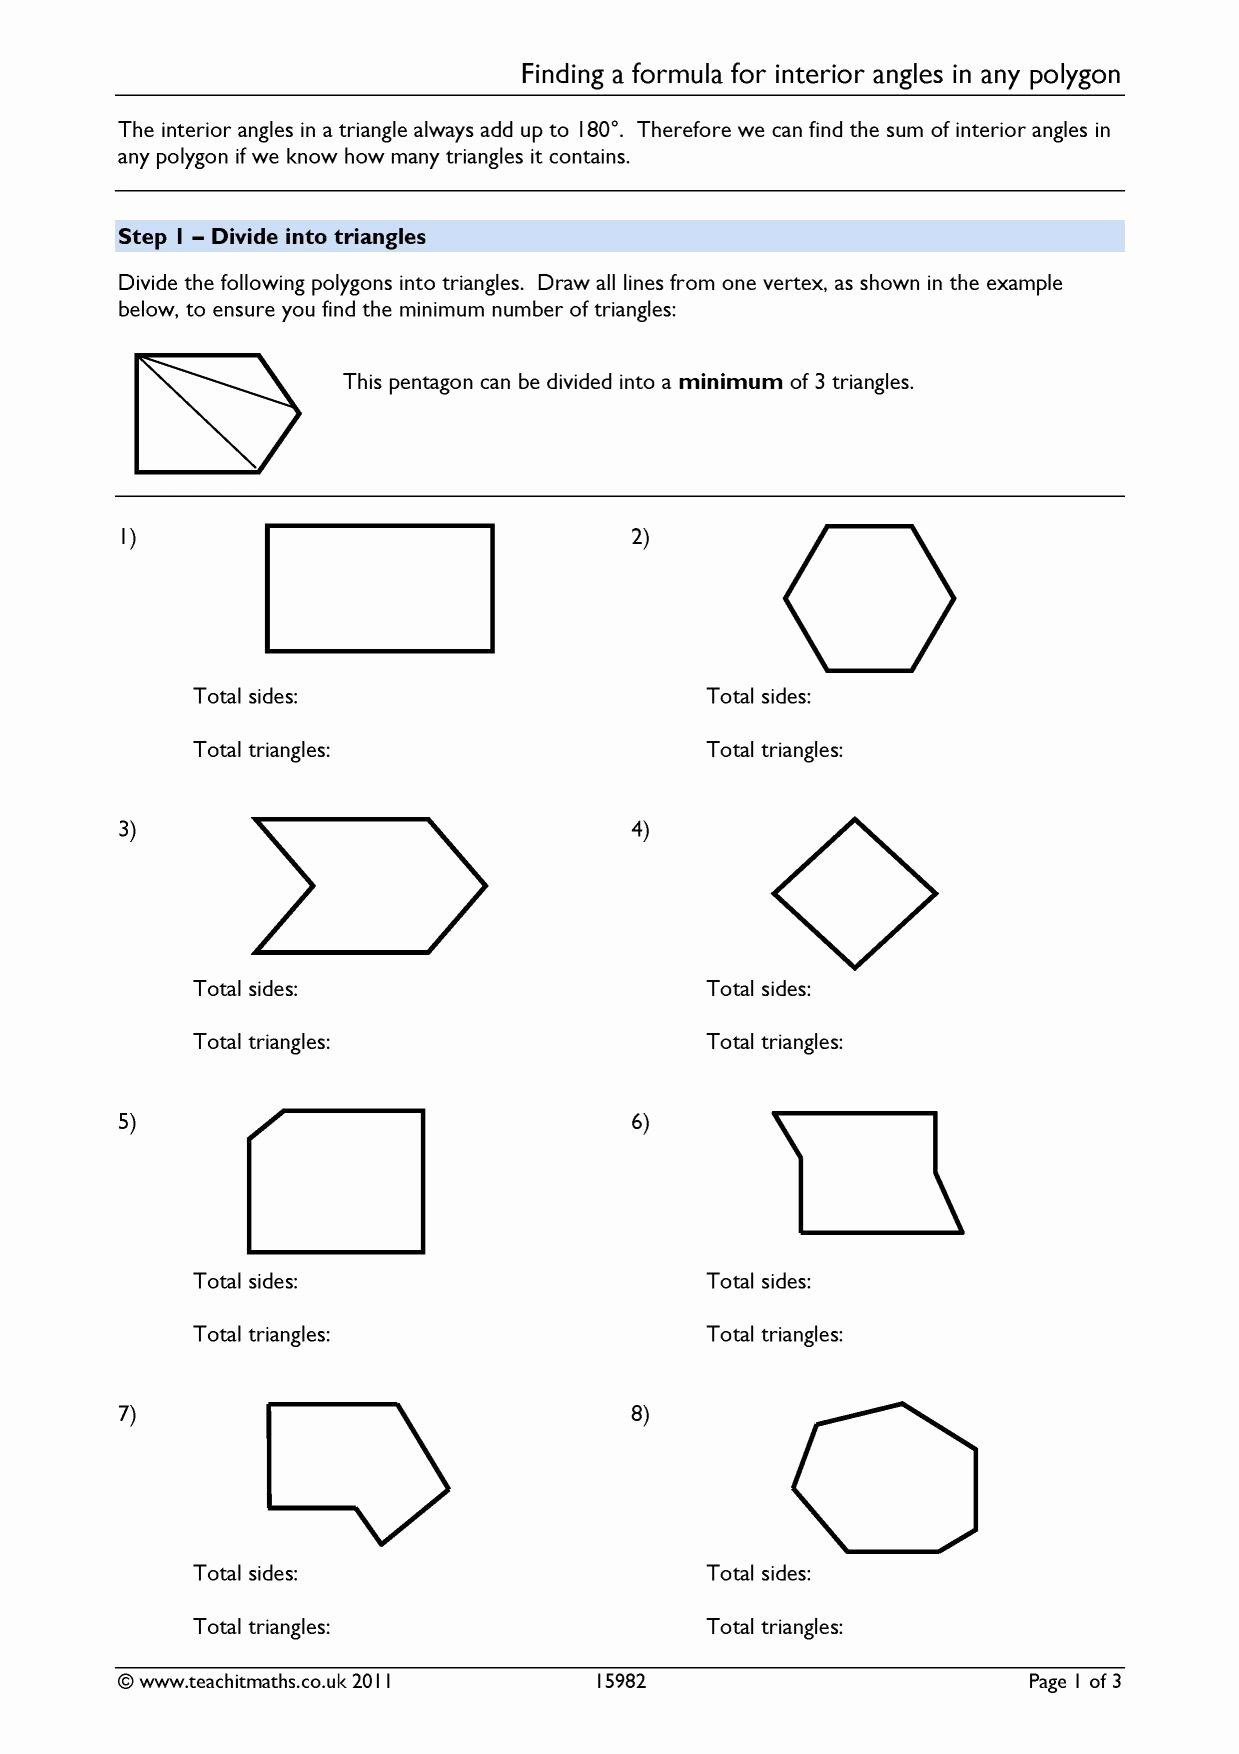 Polygon and Angles Worksheet Elegant Worksheet Interior Angles A Polygon Worksheet Grass